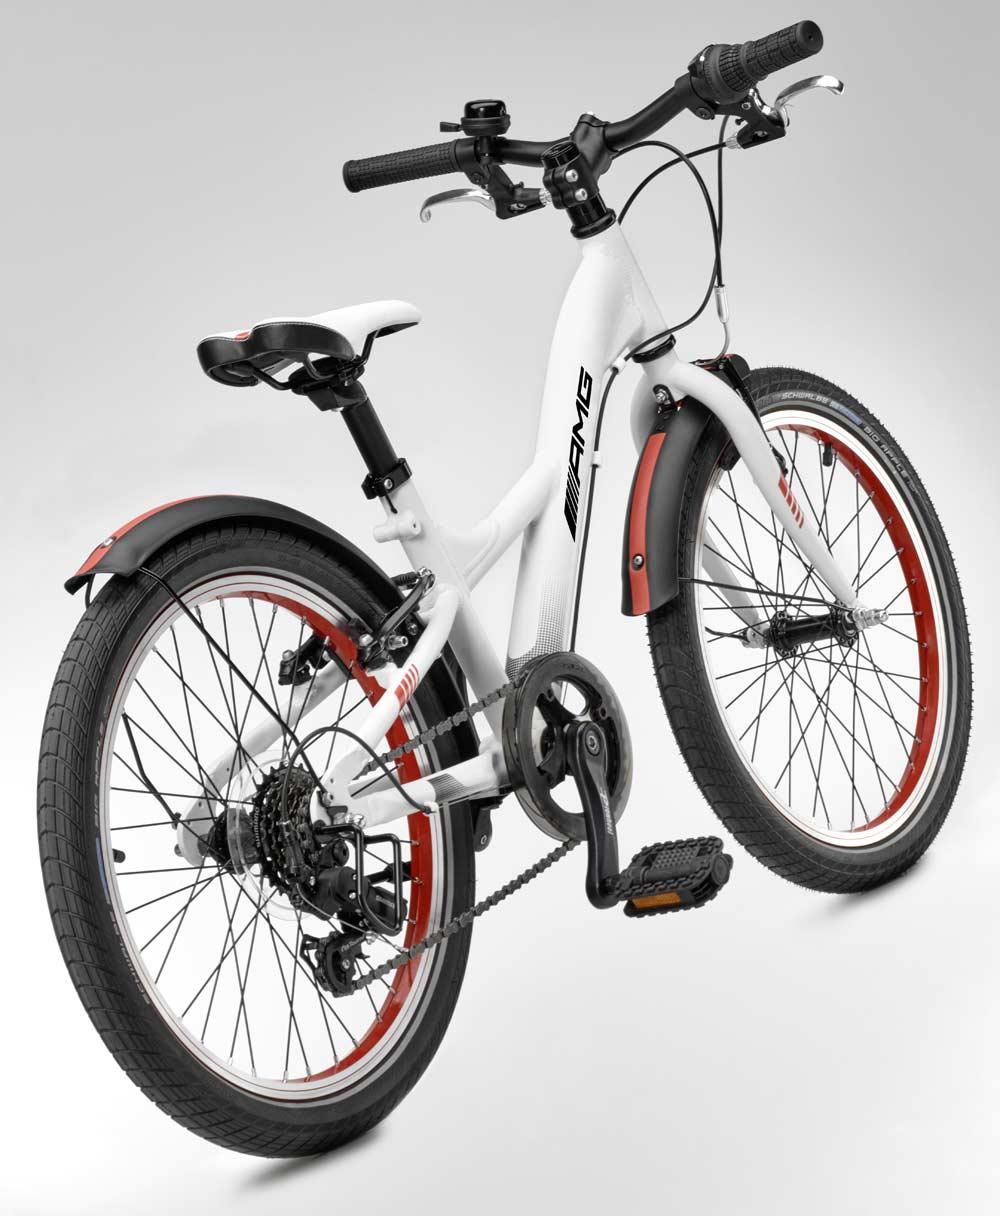 Детский велосипед Mercedes-Benz Chidren's Bike, White, EU